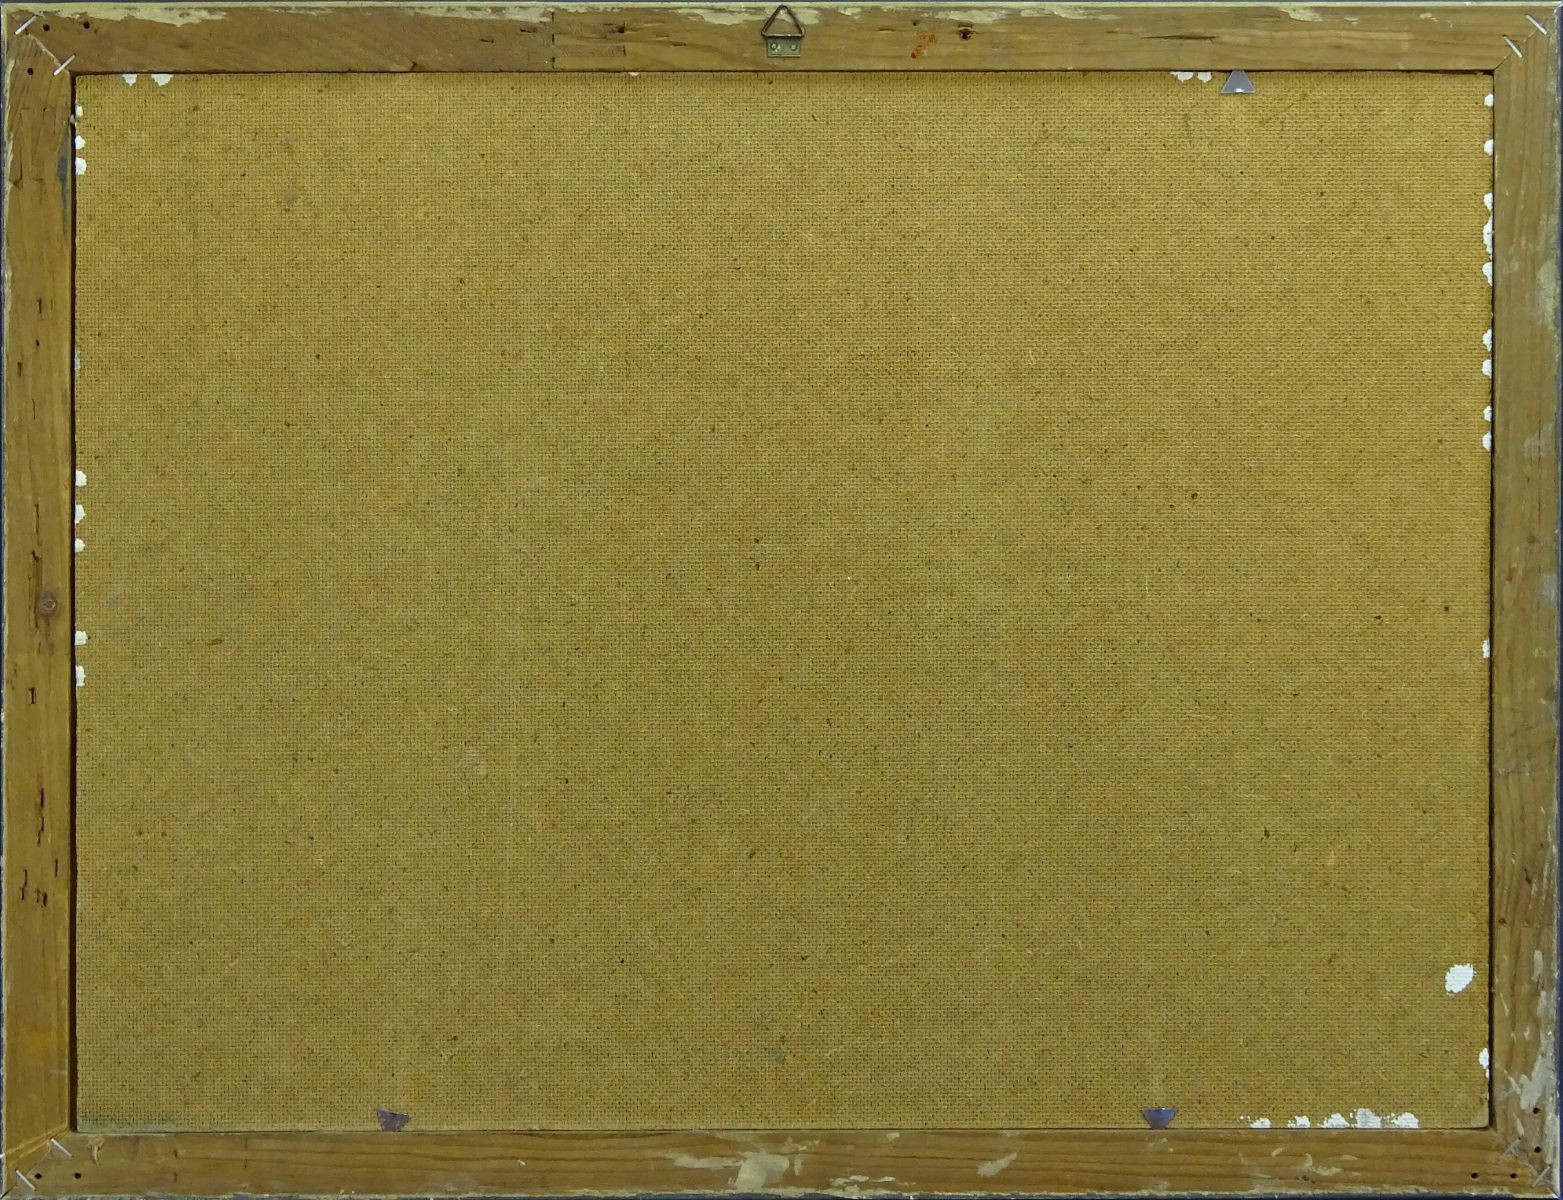 DSC01236.JPG (1563�1200)